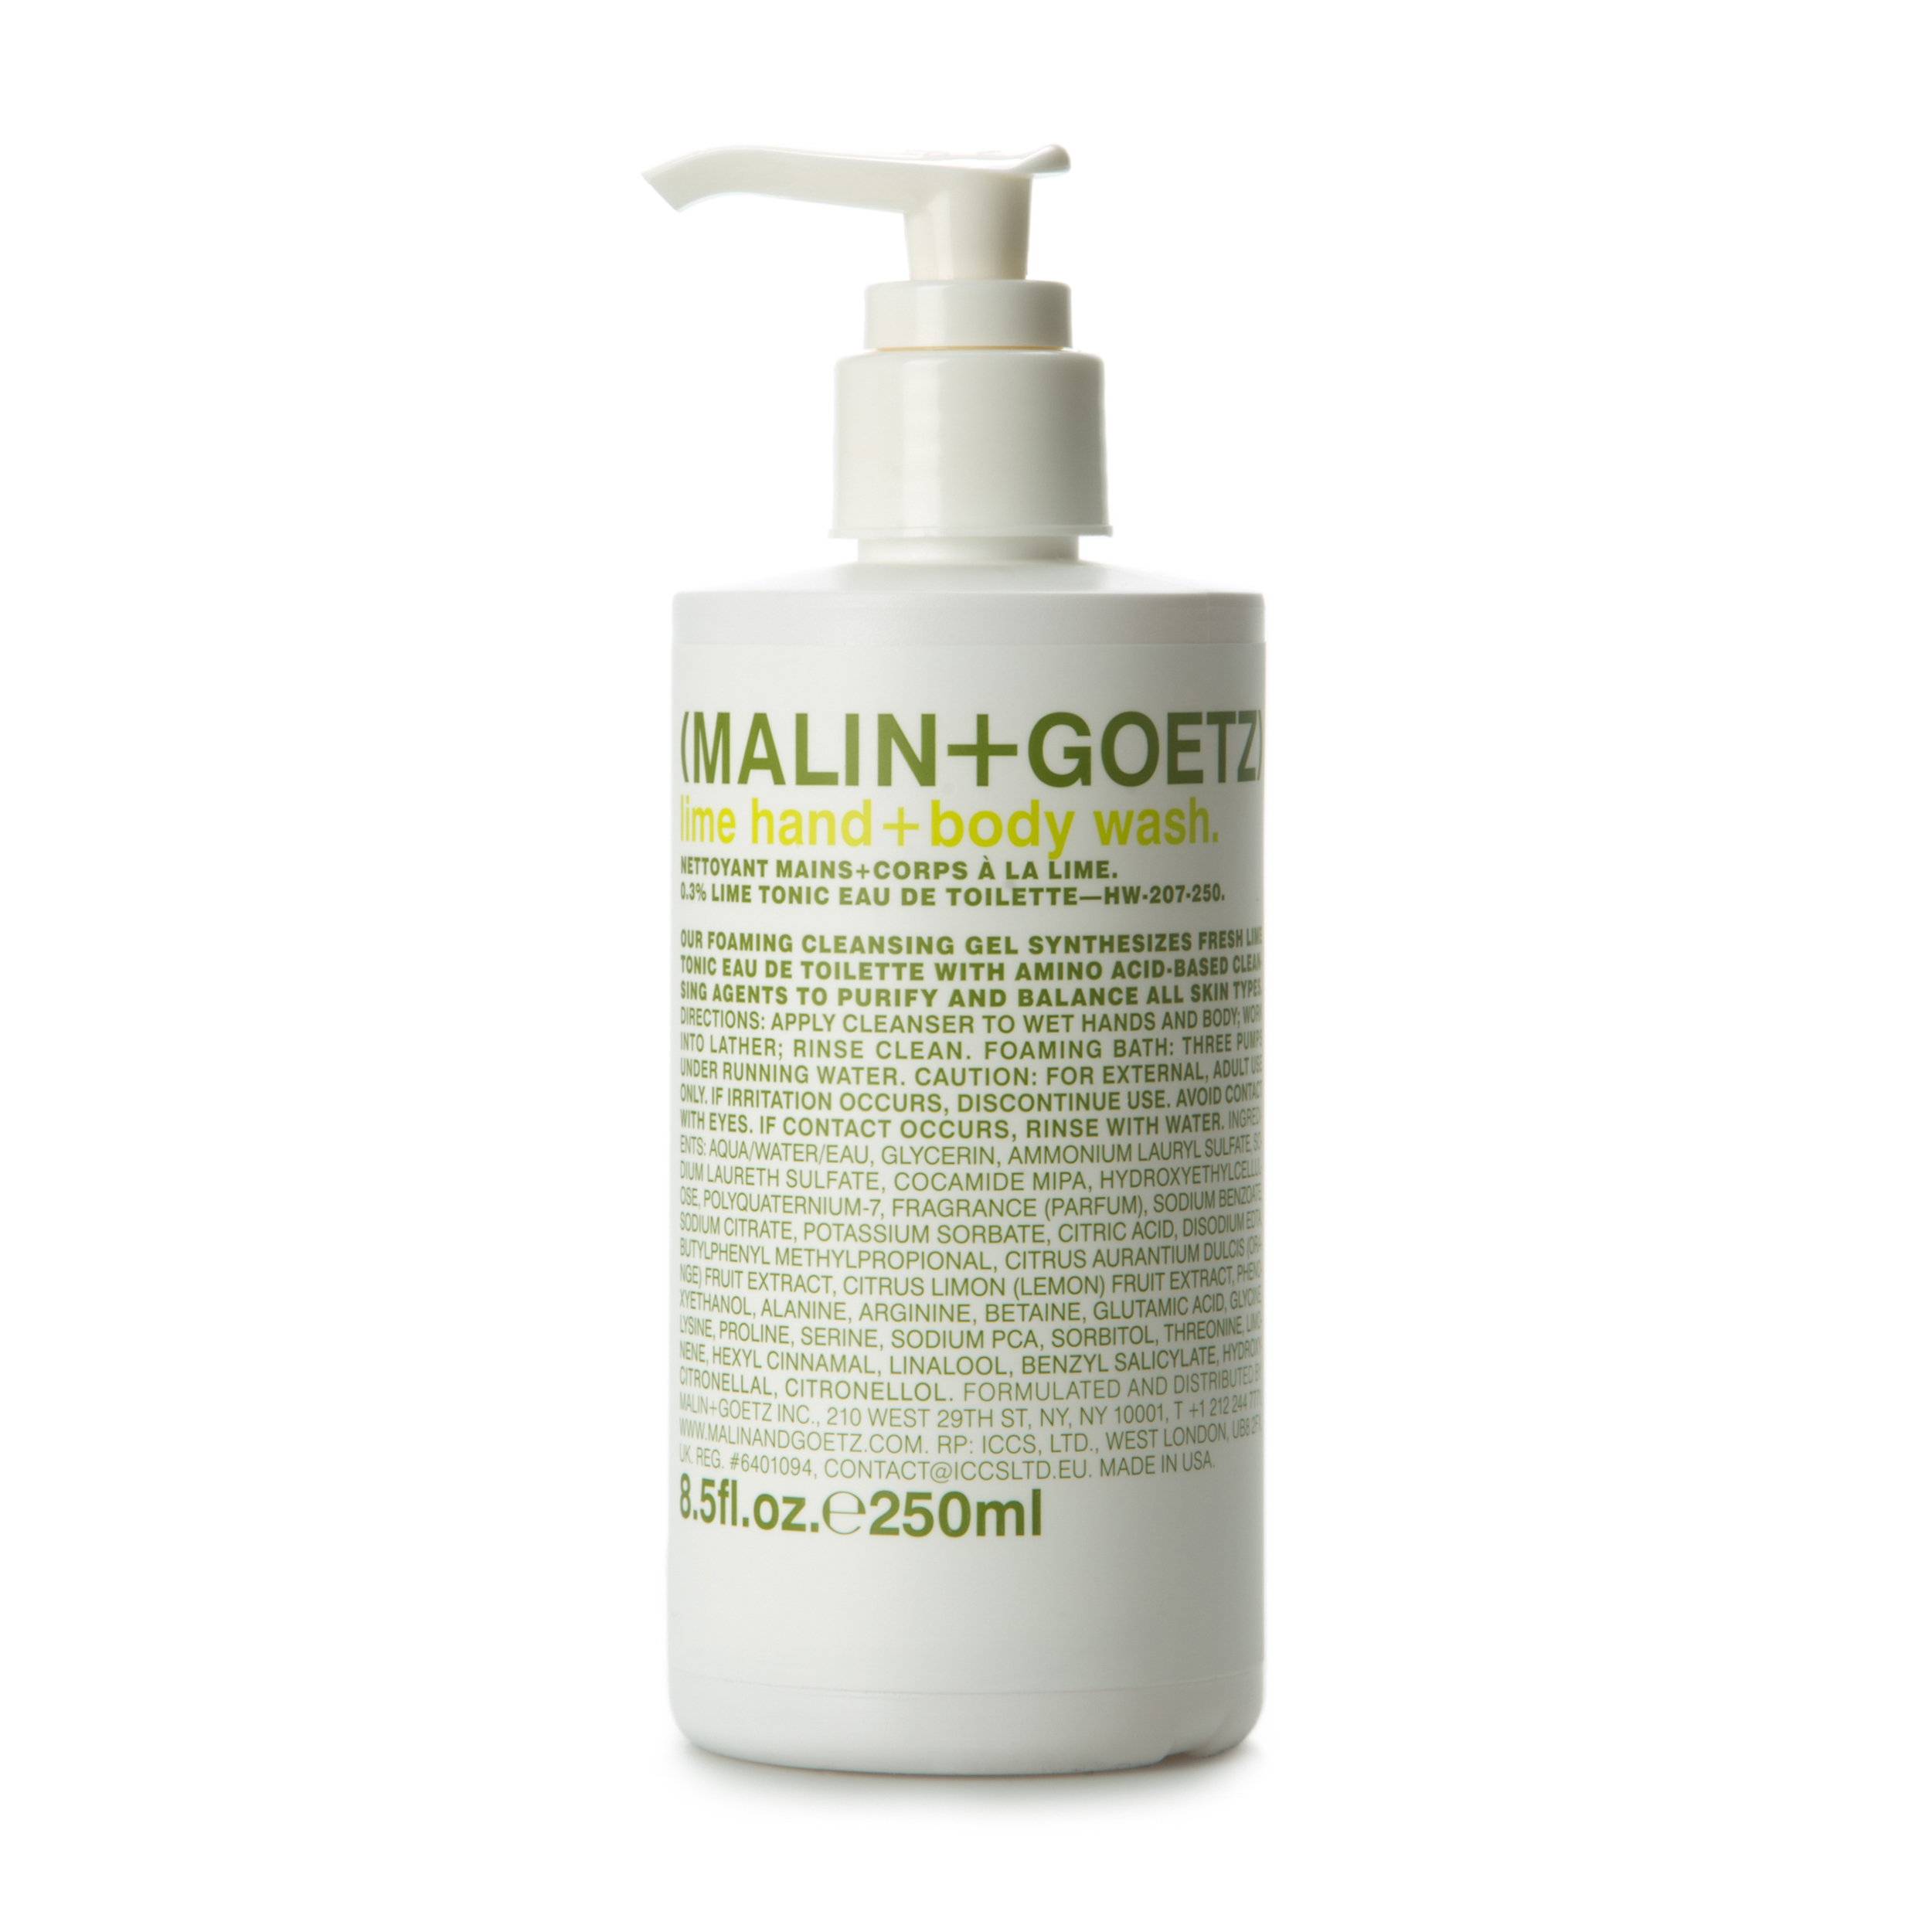 MALIN+GOETZ Гель-мыло для душа и рук «Lime» 250 мл фото